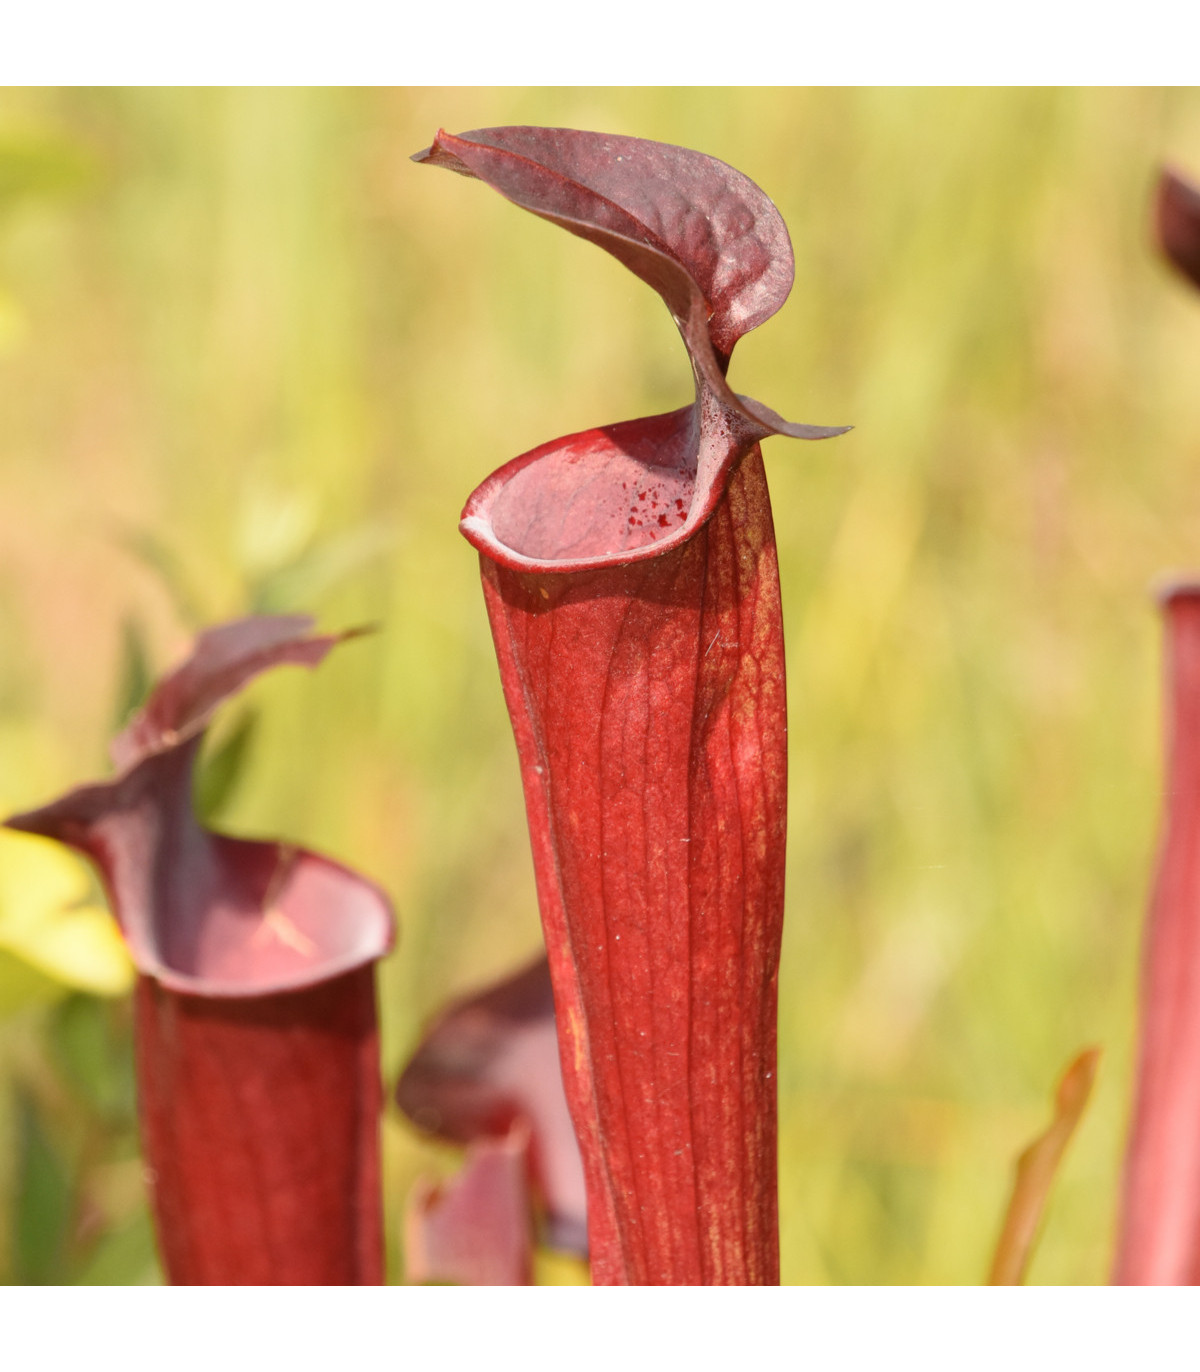 Špirlice červená - semena Špirlice červené - masožravka Sarracenia rubra - 12 ks